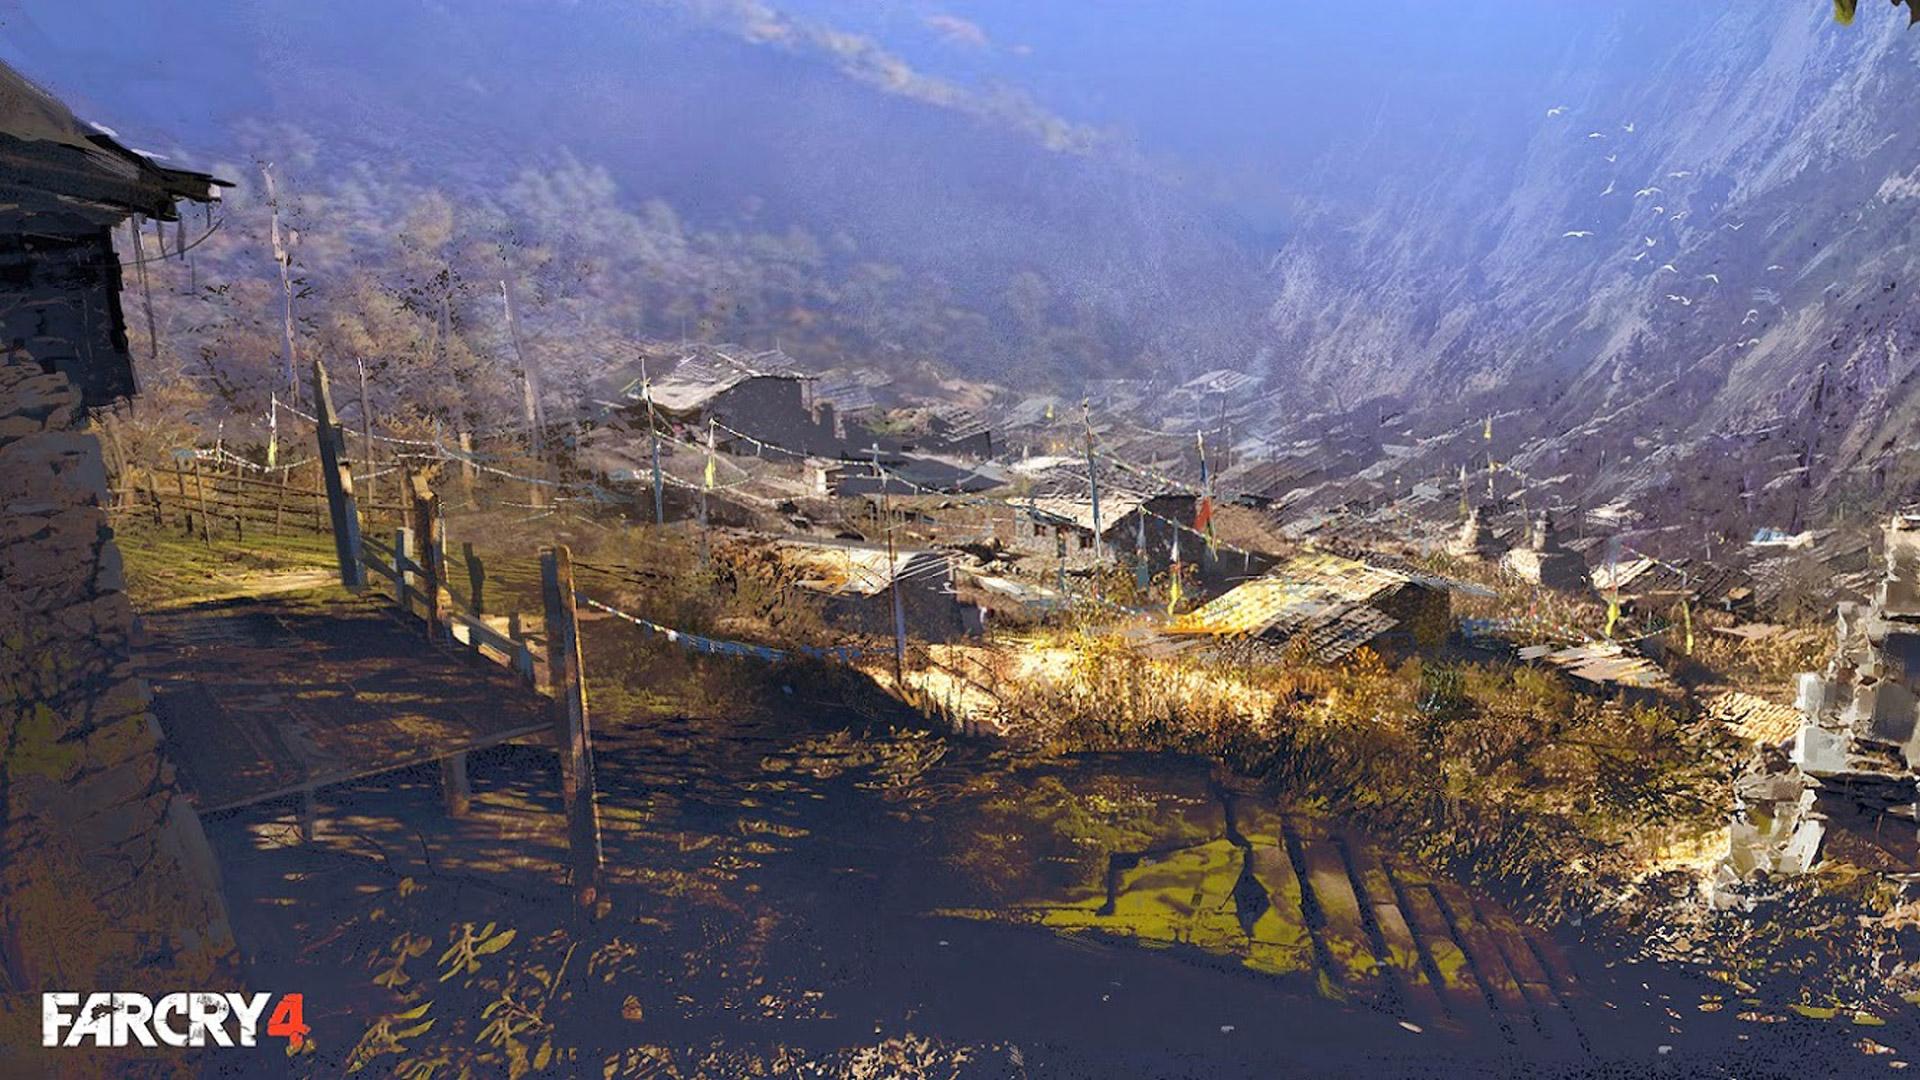 Far Cry 4 Wallpaper in 1920x1080